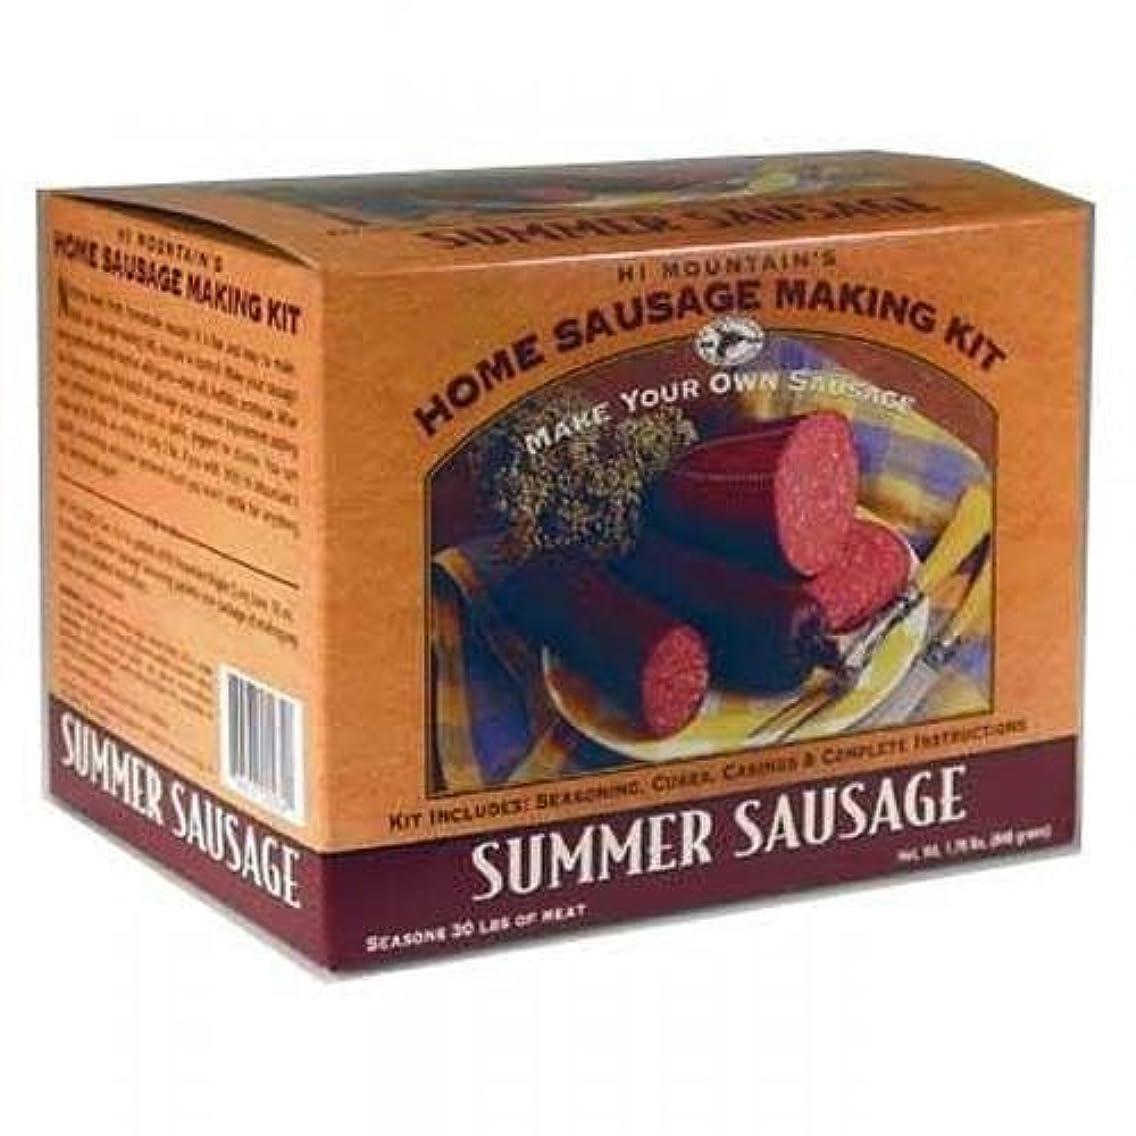 Mountain Jerky – Original Summer Sausage Kit – Make Your Own Sausage